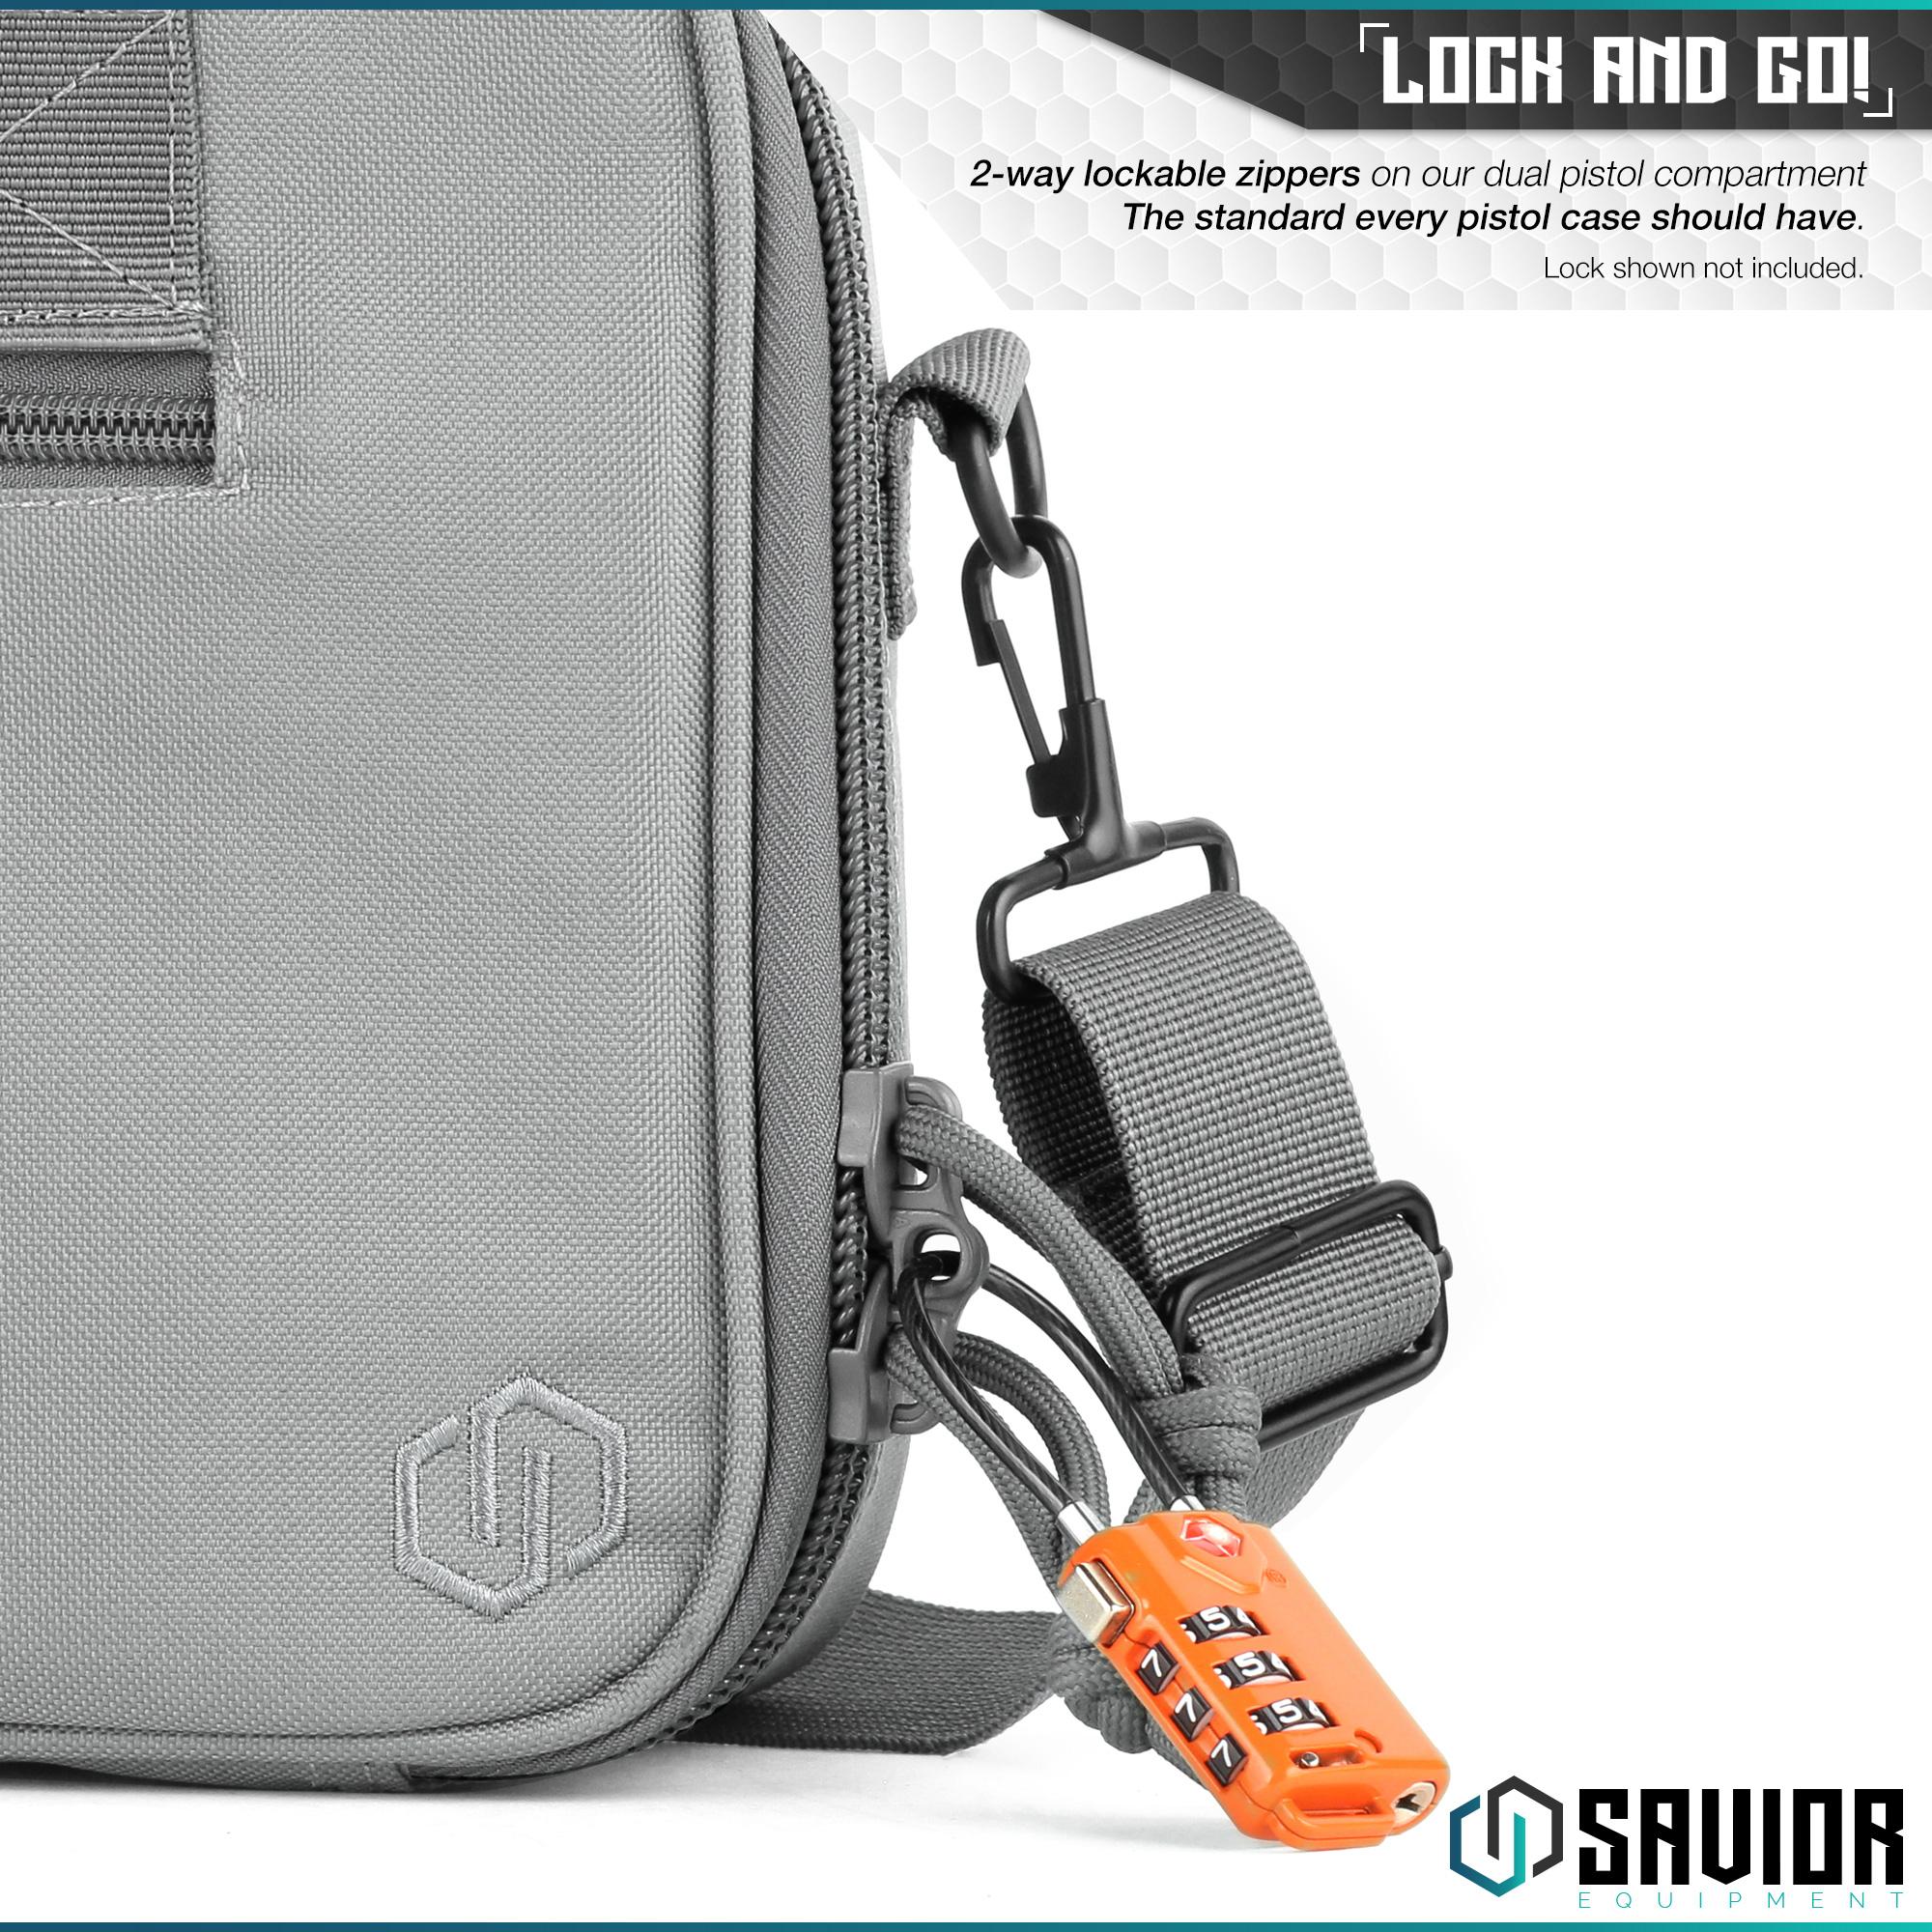 thumbnail 5 - 034-SAVIOR-034-Padded-Discreet-Double-Handgun-Bag-Pistol-Storage-Case-w-Mag-Pouch-Slot